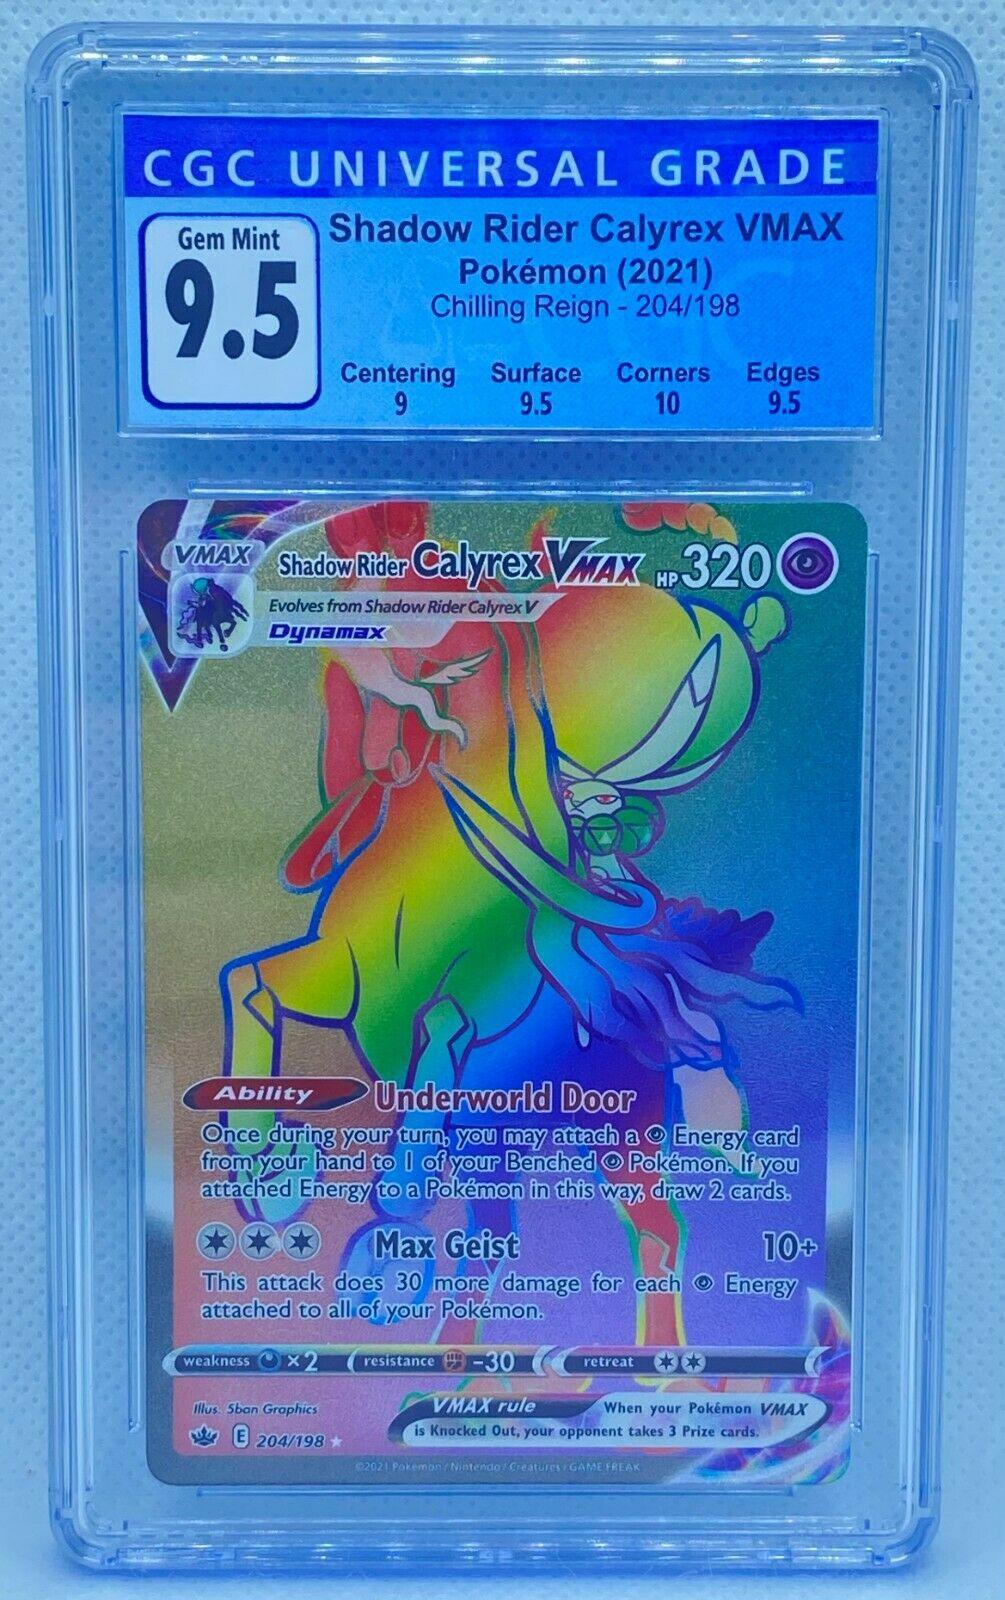 Pokémon TCG Shadow Rider Calyrex VMAX 204/198   Chilling Reign   CGC 9.5   PSA